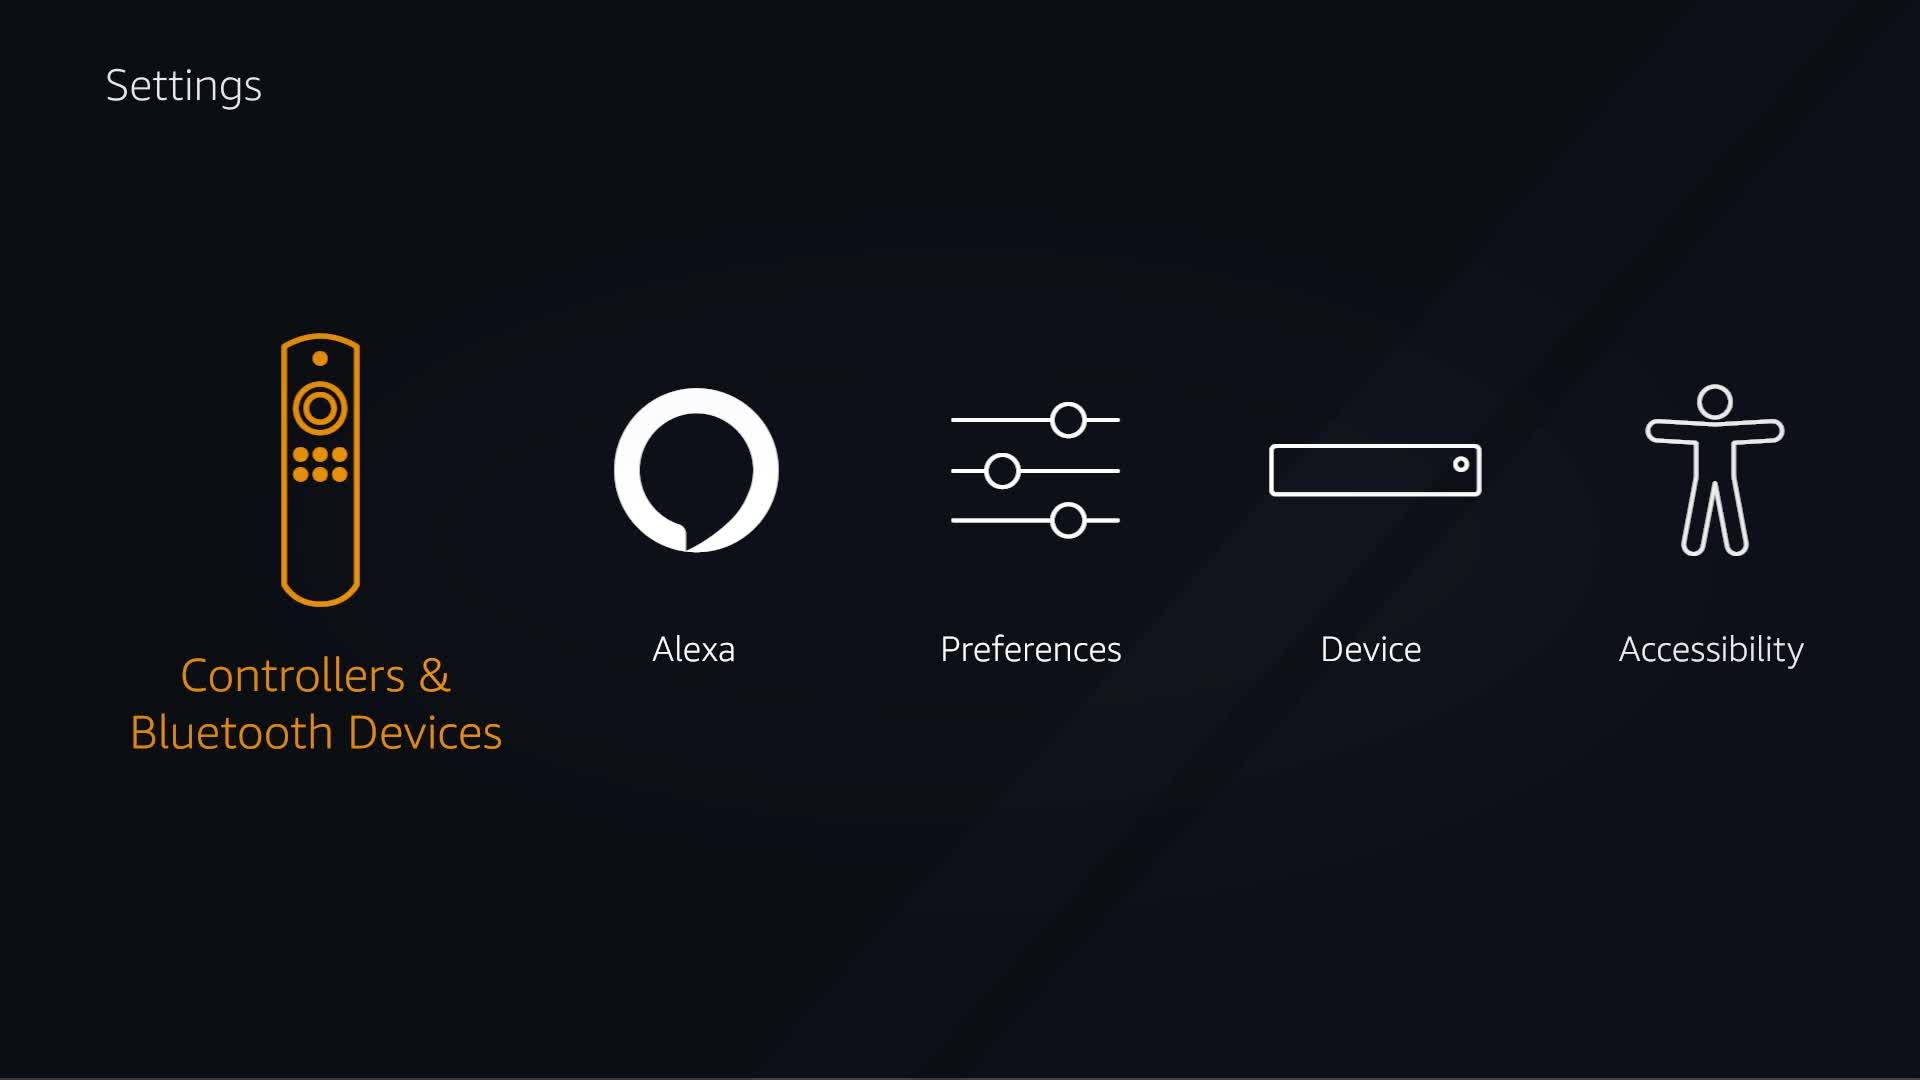 amazon com help fire tv settings basics